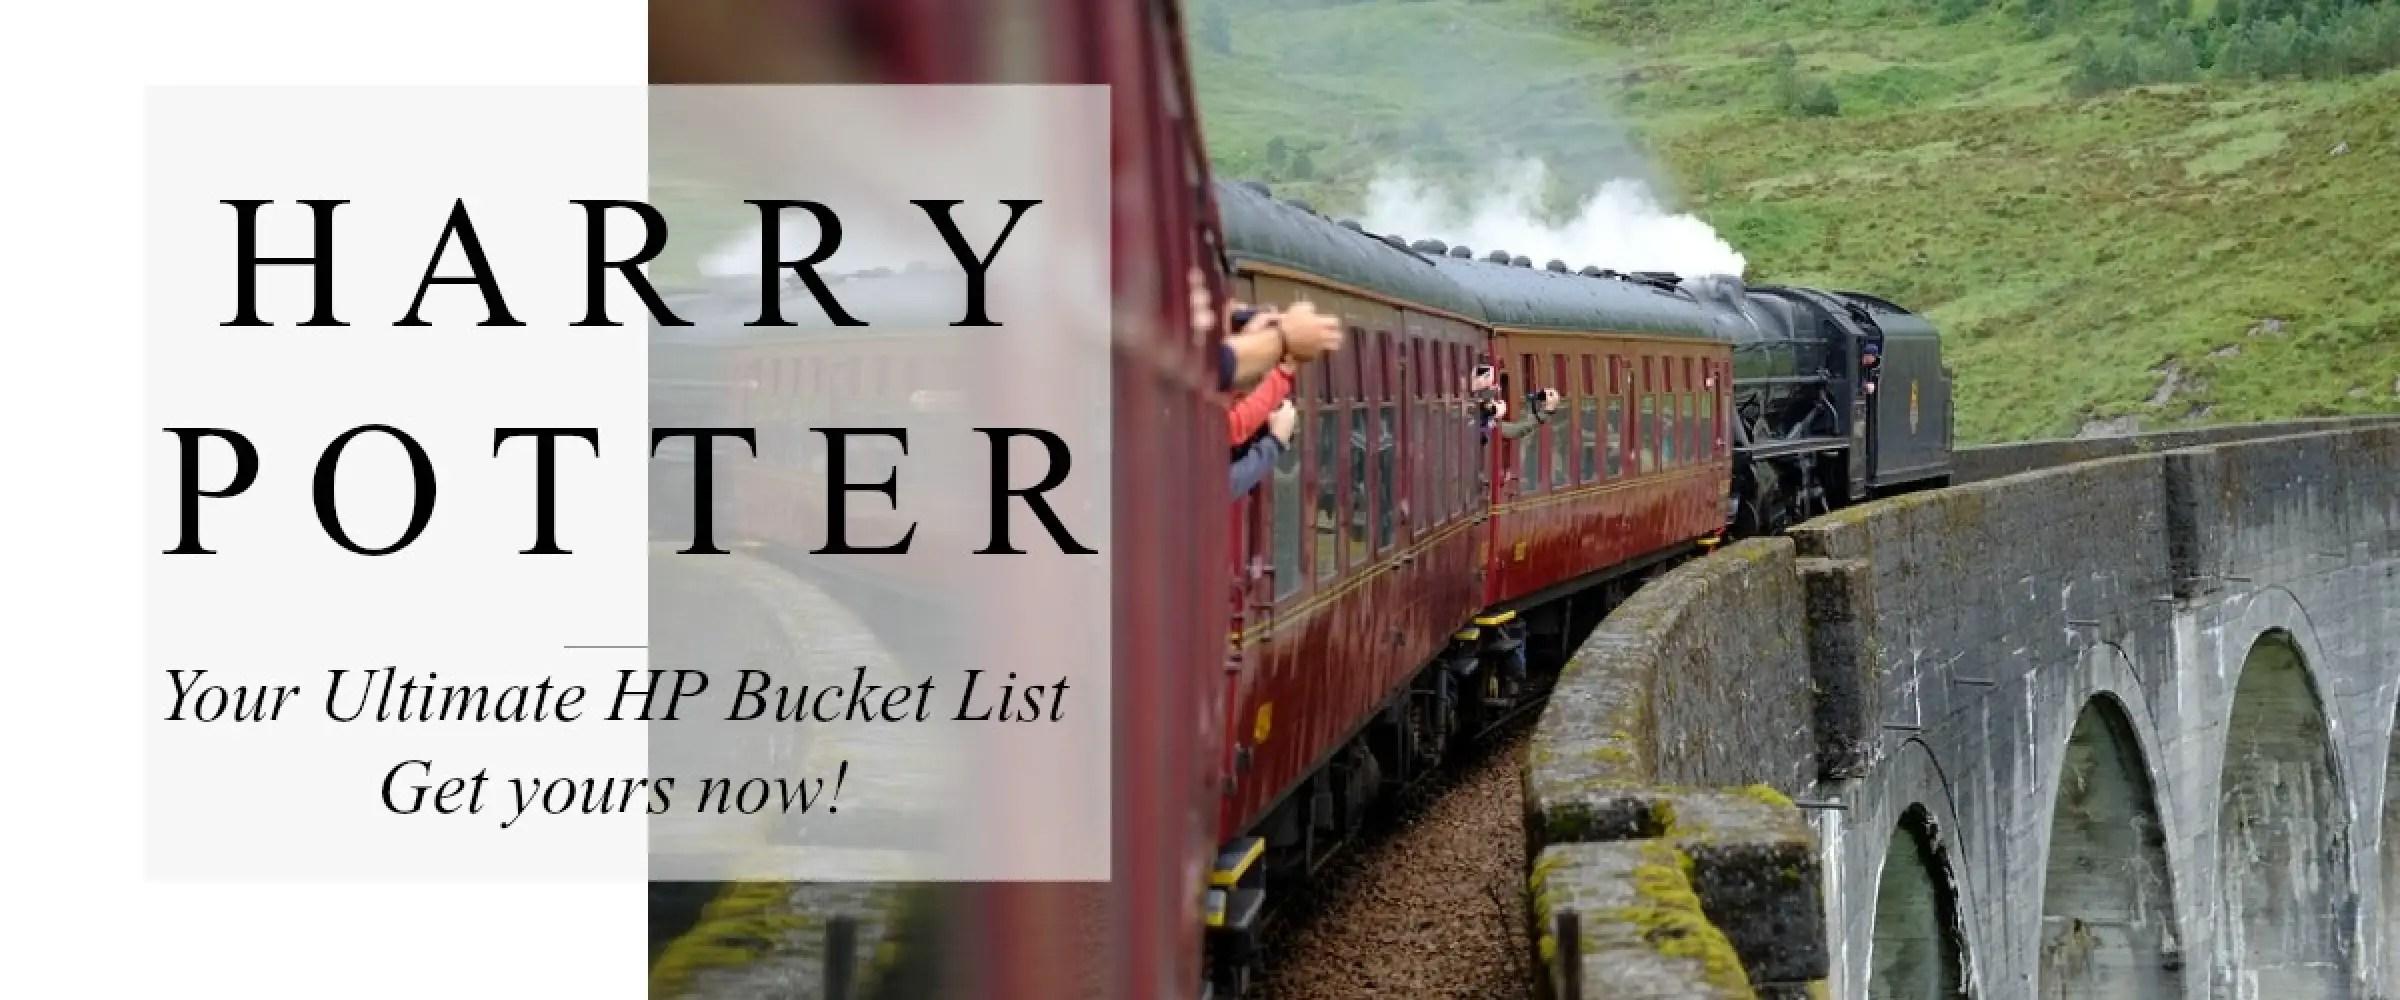 FB HP Bucket List